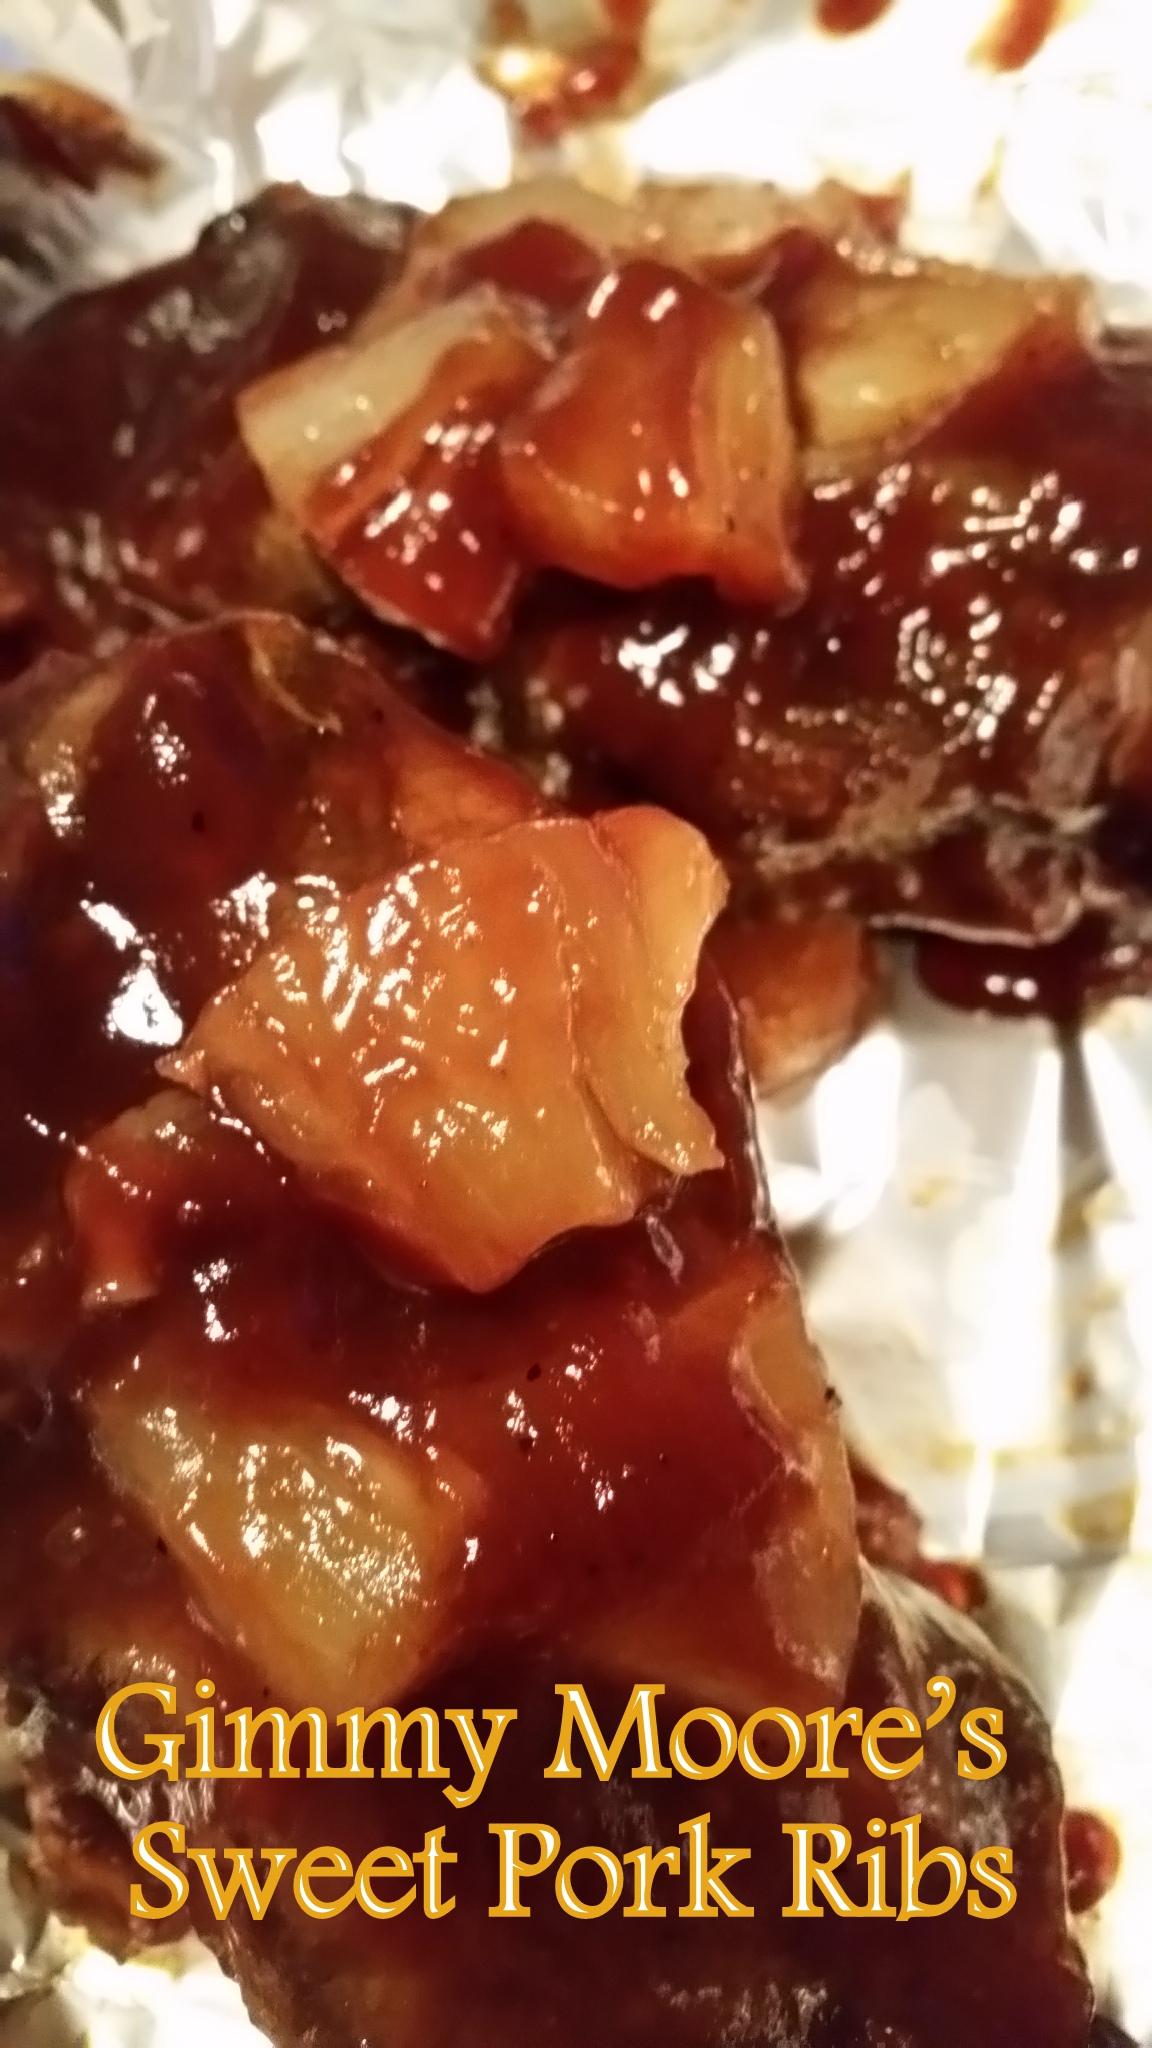 Sweet Pork Ribs